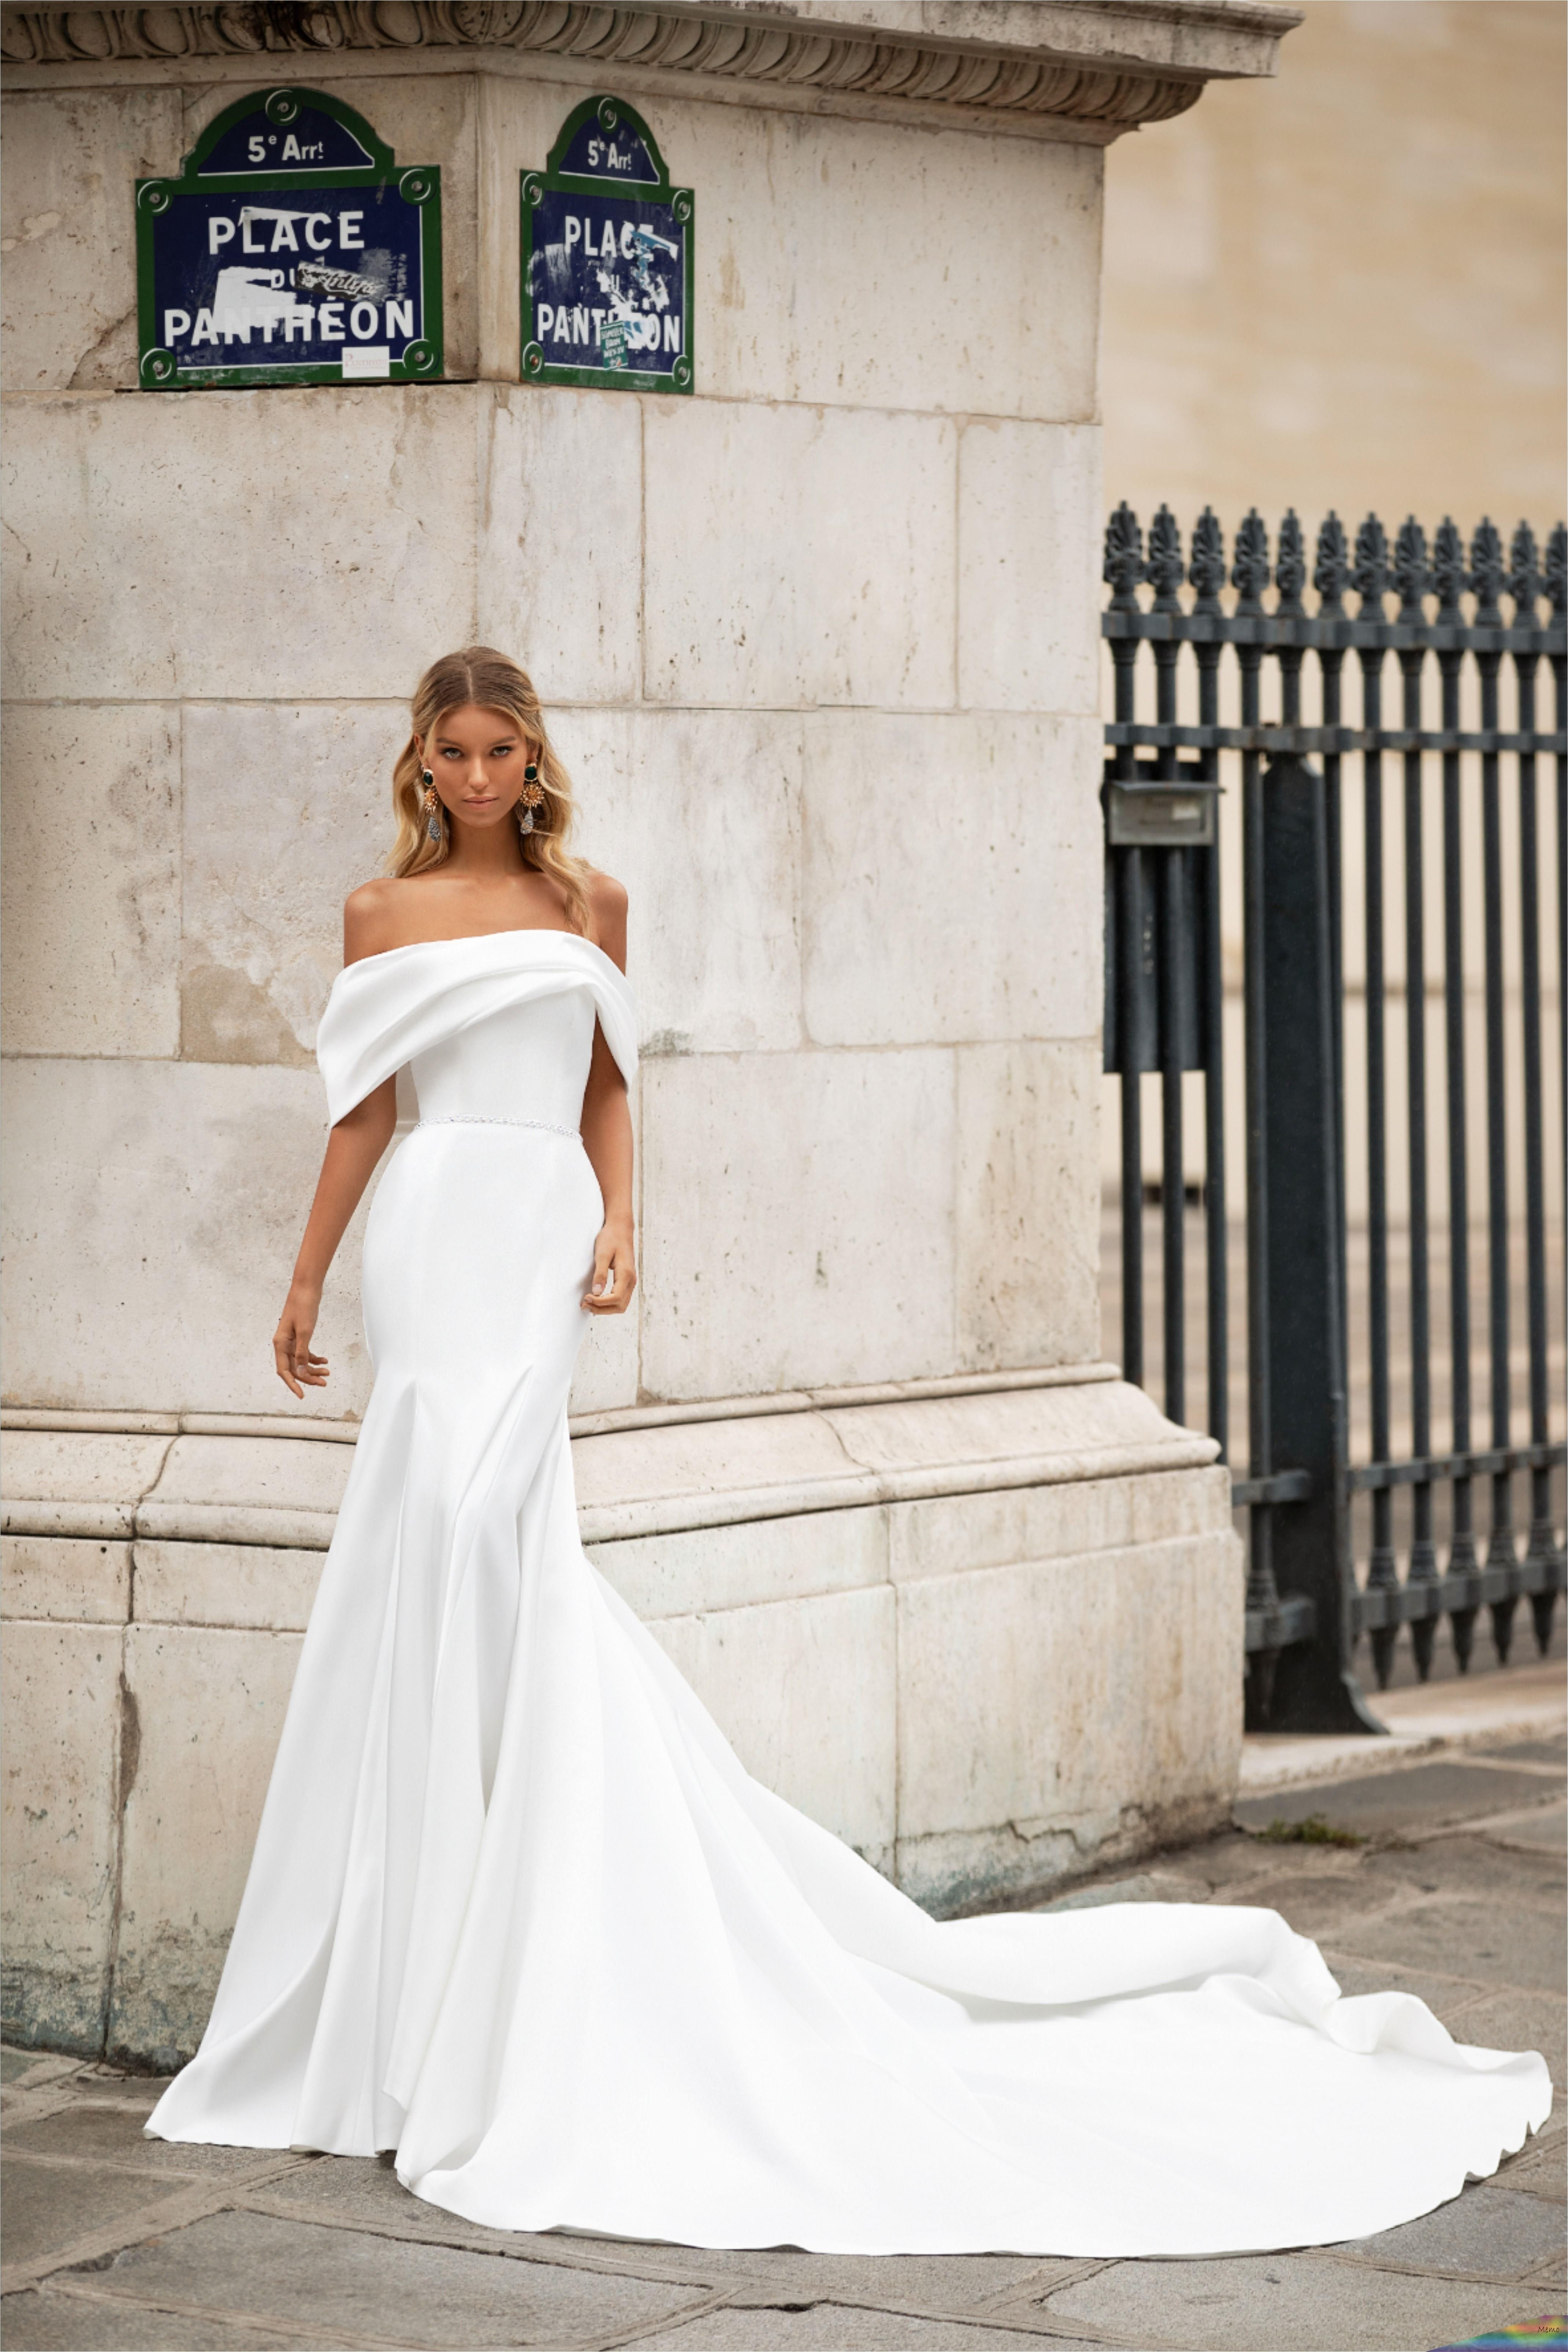 Nov 5, 5 - Stunning mermaid wedding dress. Designer wedding